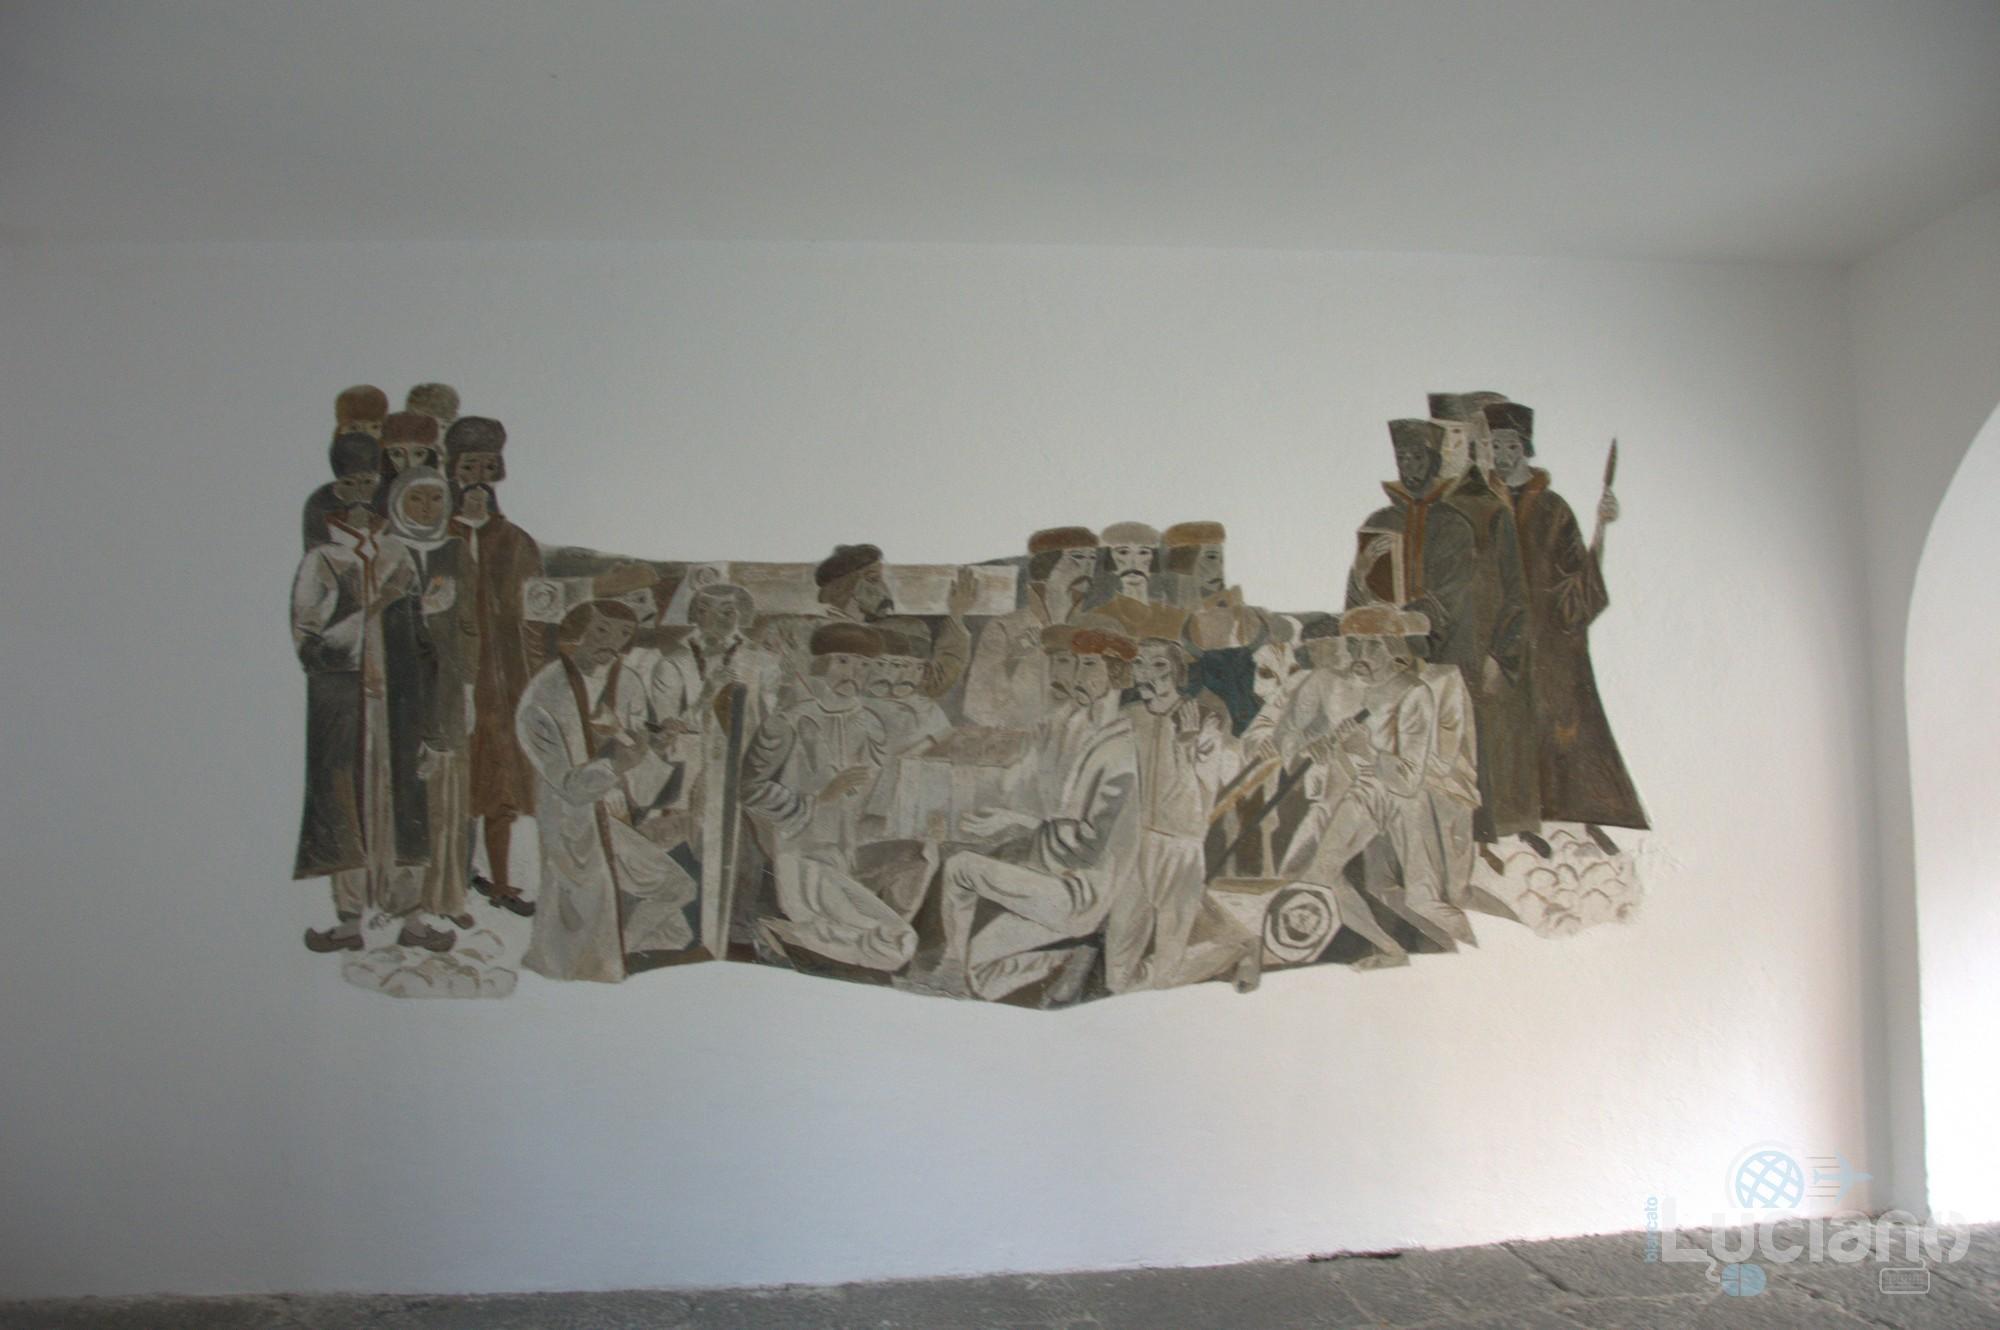 Vista interna - museo ecclesiastico - Monastero di Rila, Рилски Манастир, Rilski Manastir - Sofia - Bulgaria